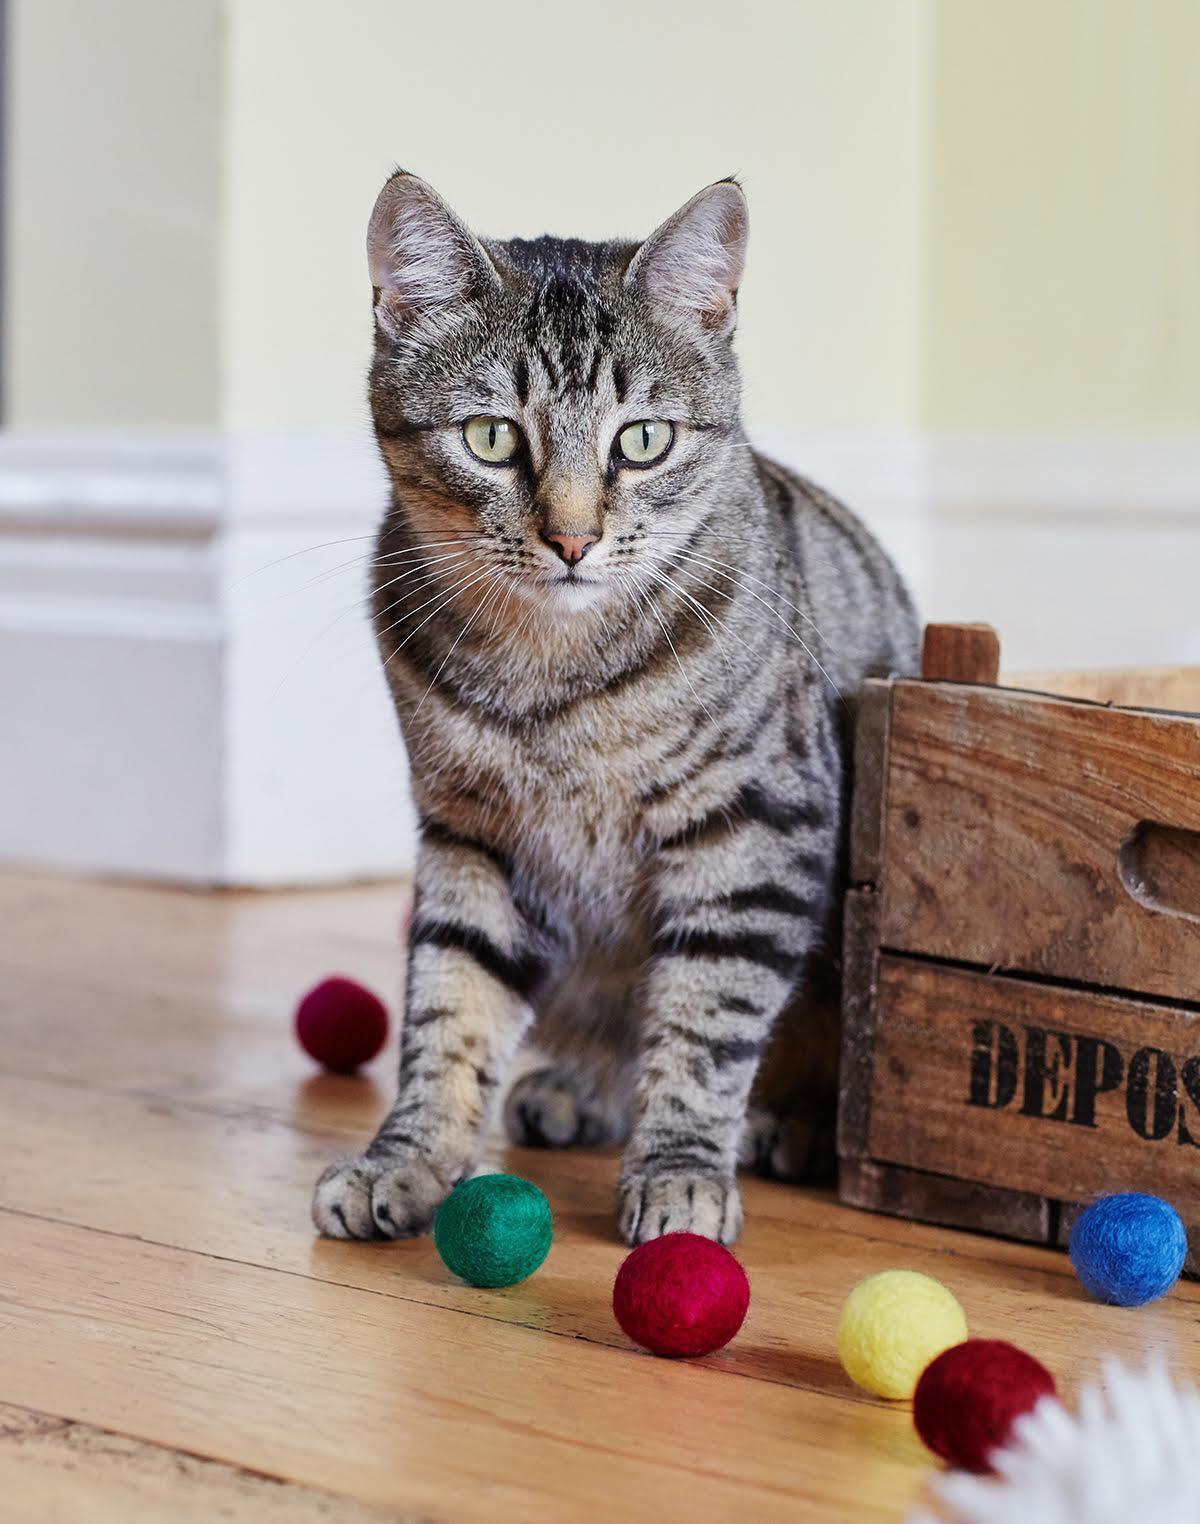 felt ball cat toys bright and colourful natural felt. Black Bedroom Furniture Sets. Home Design Ideas